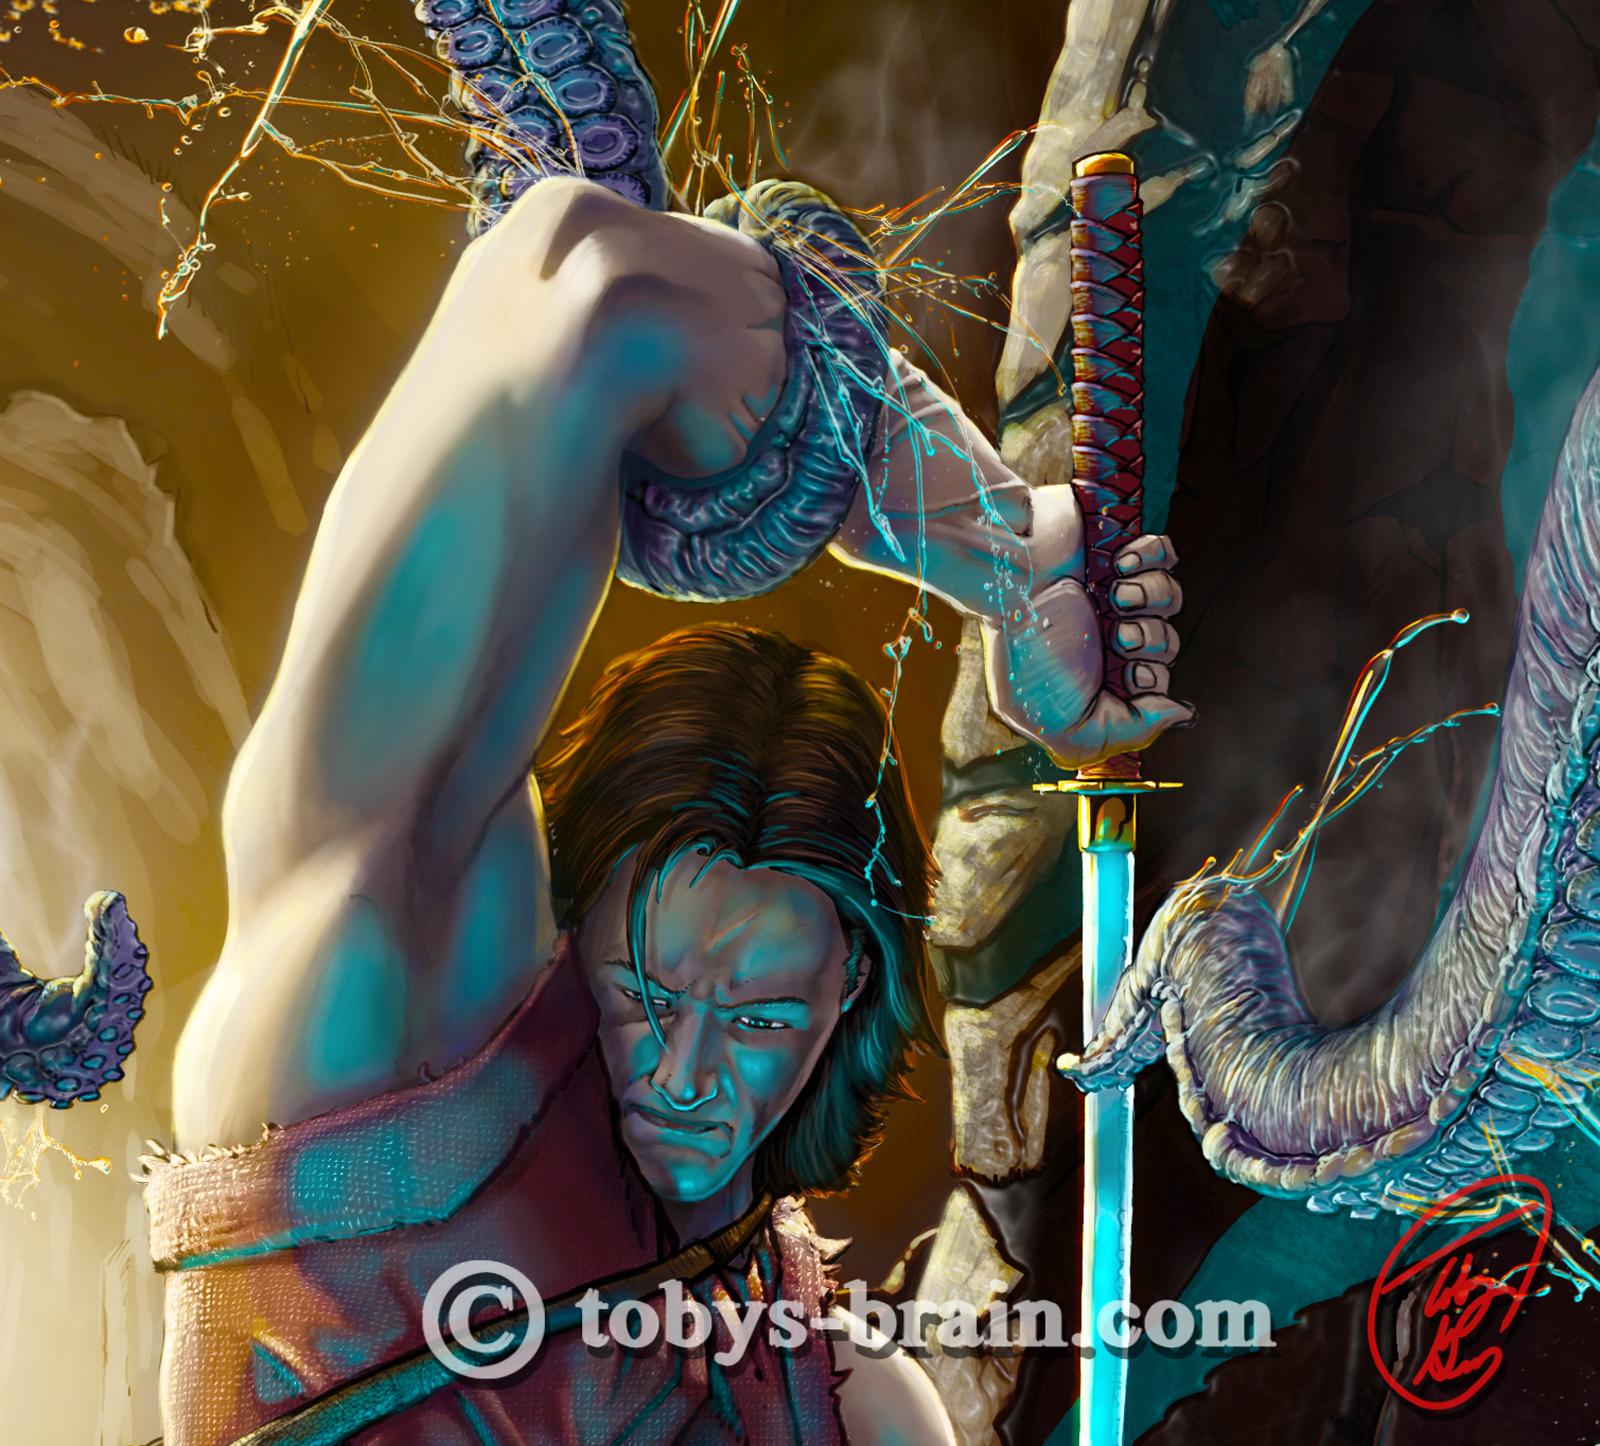 Toby Gray Ohrim-vs-the-cave-squid-zoom2-FW